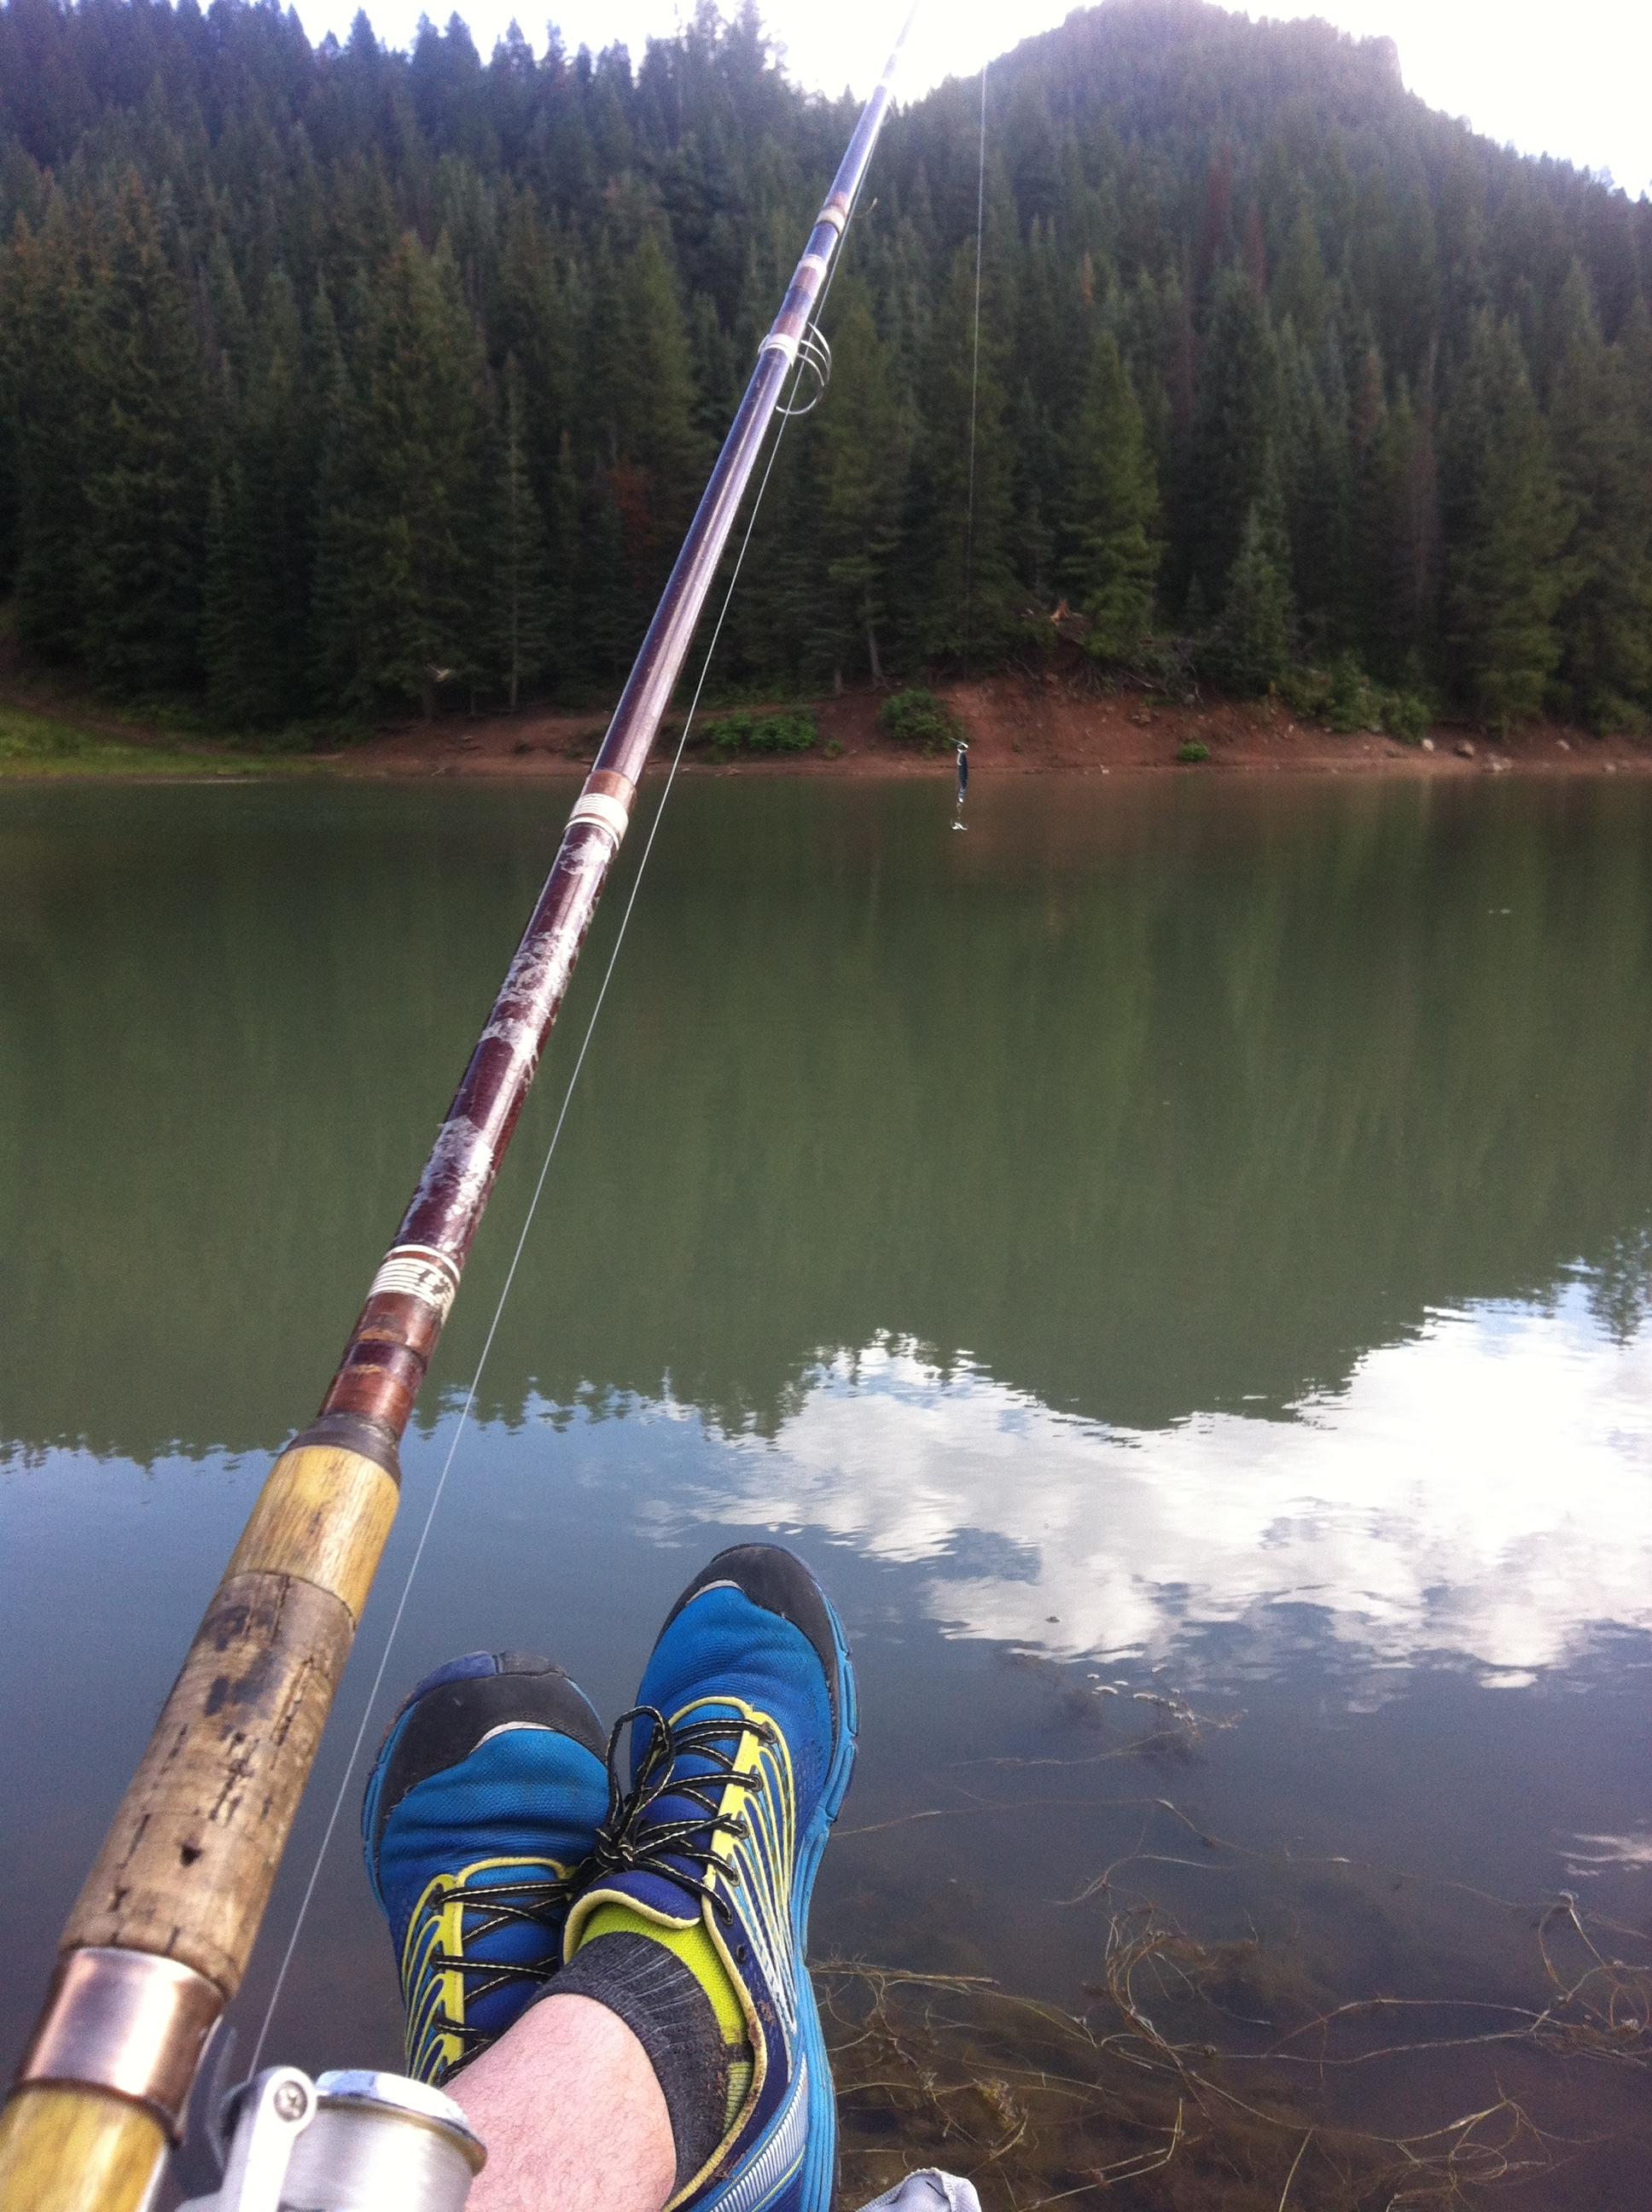 FishingFallingManCactusDivingBoard (3)